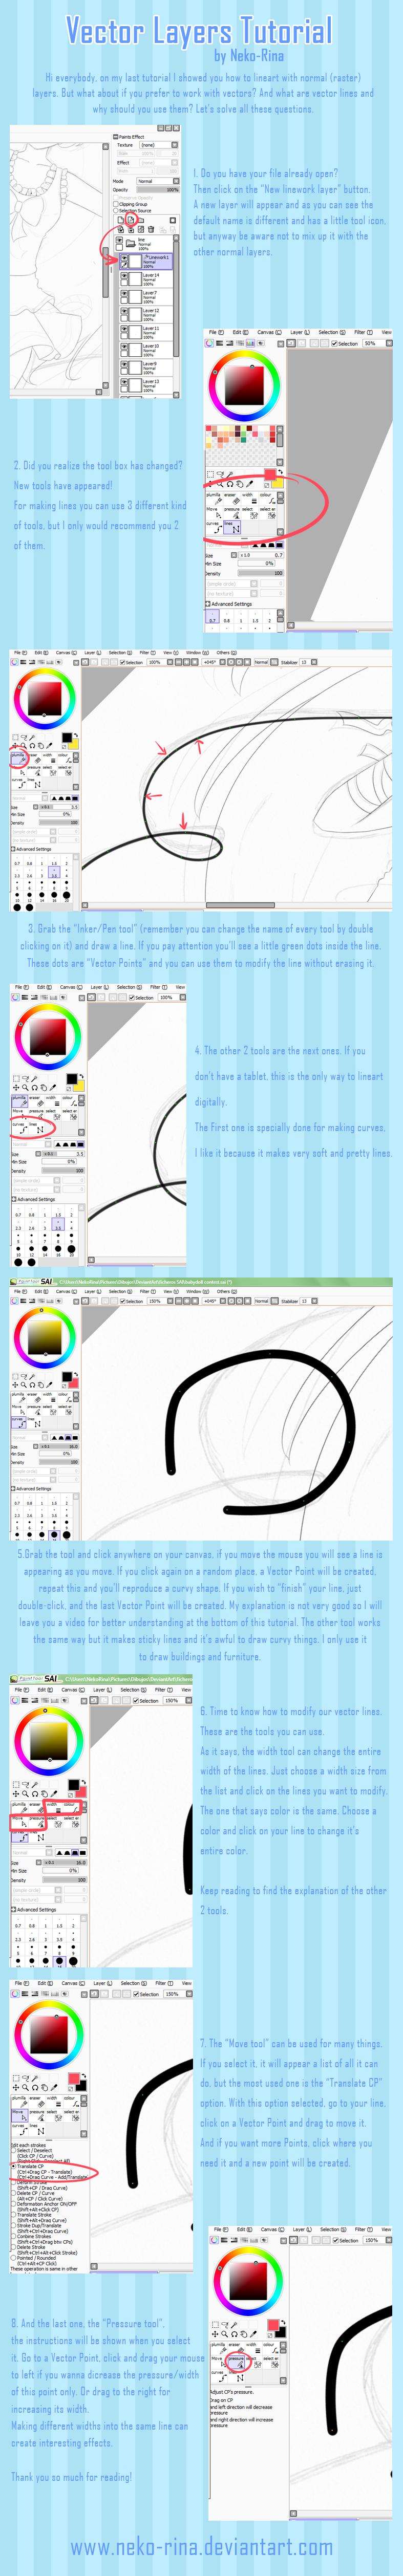 Vector Layers Tutorial